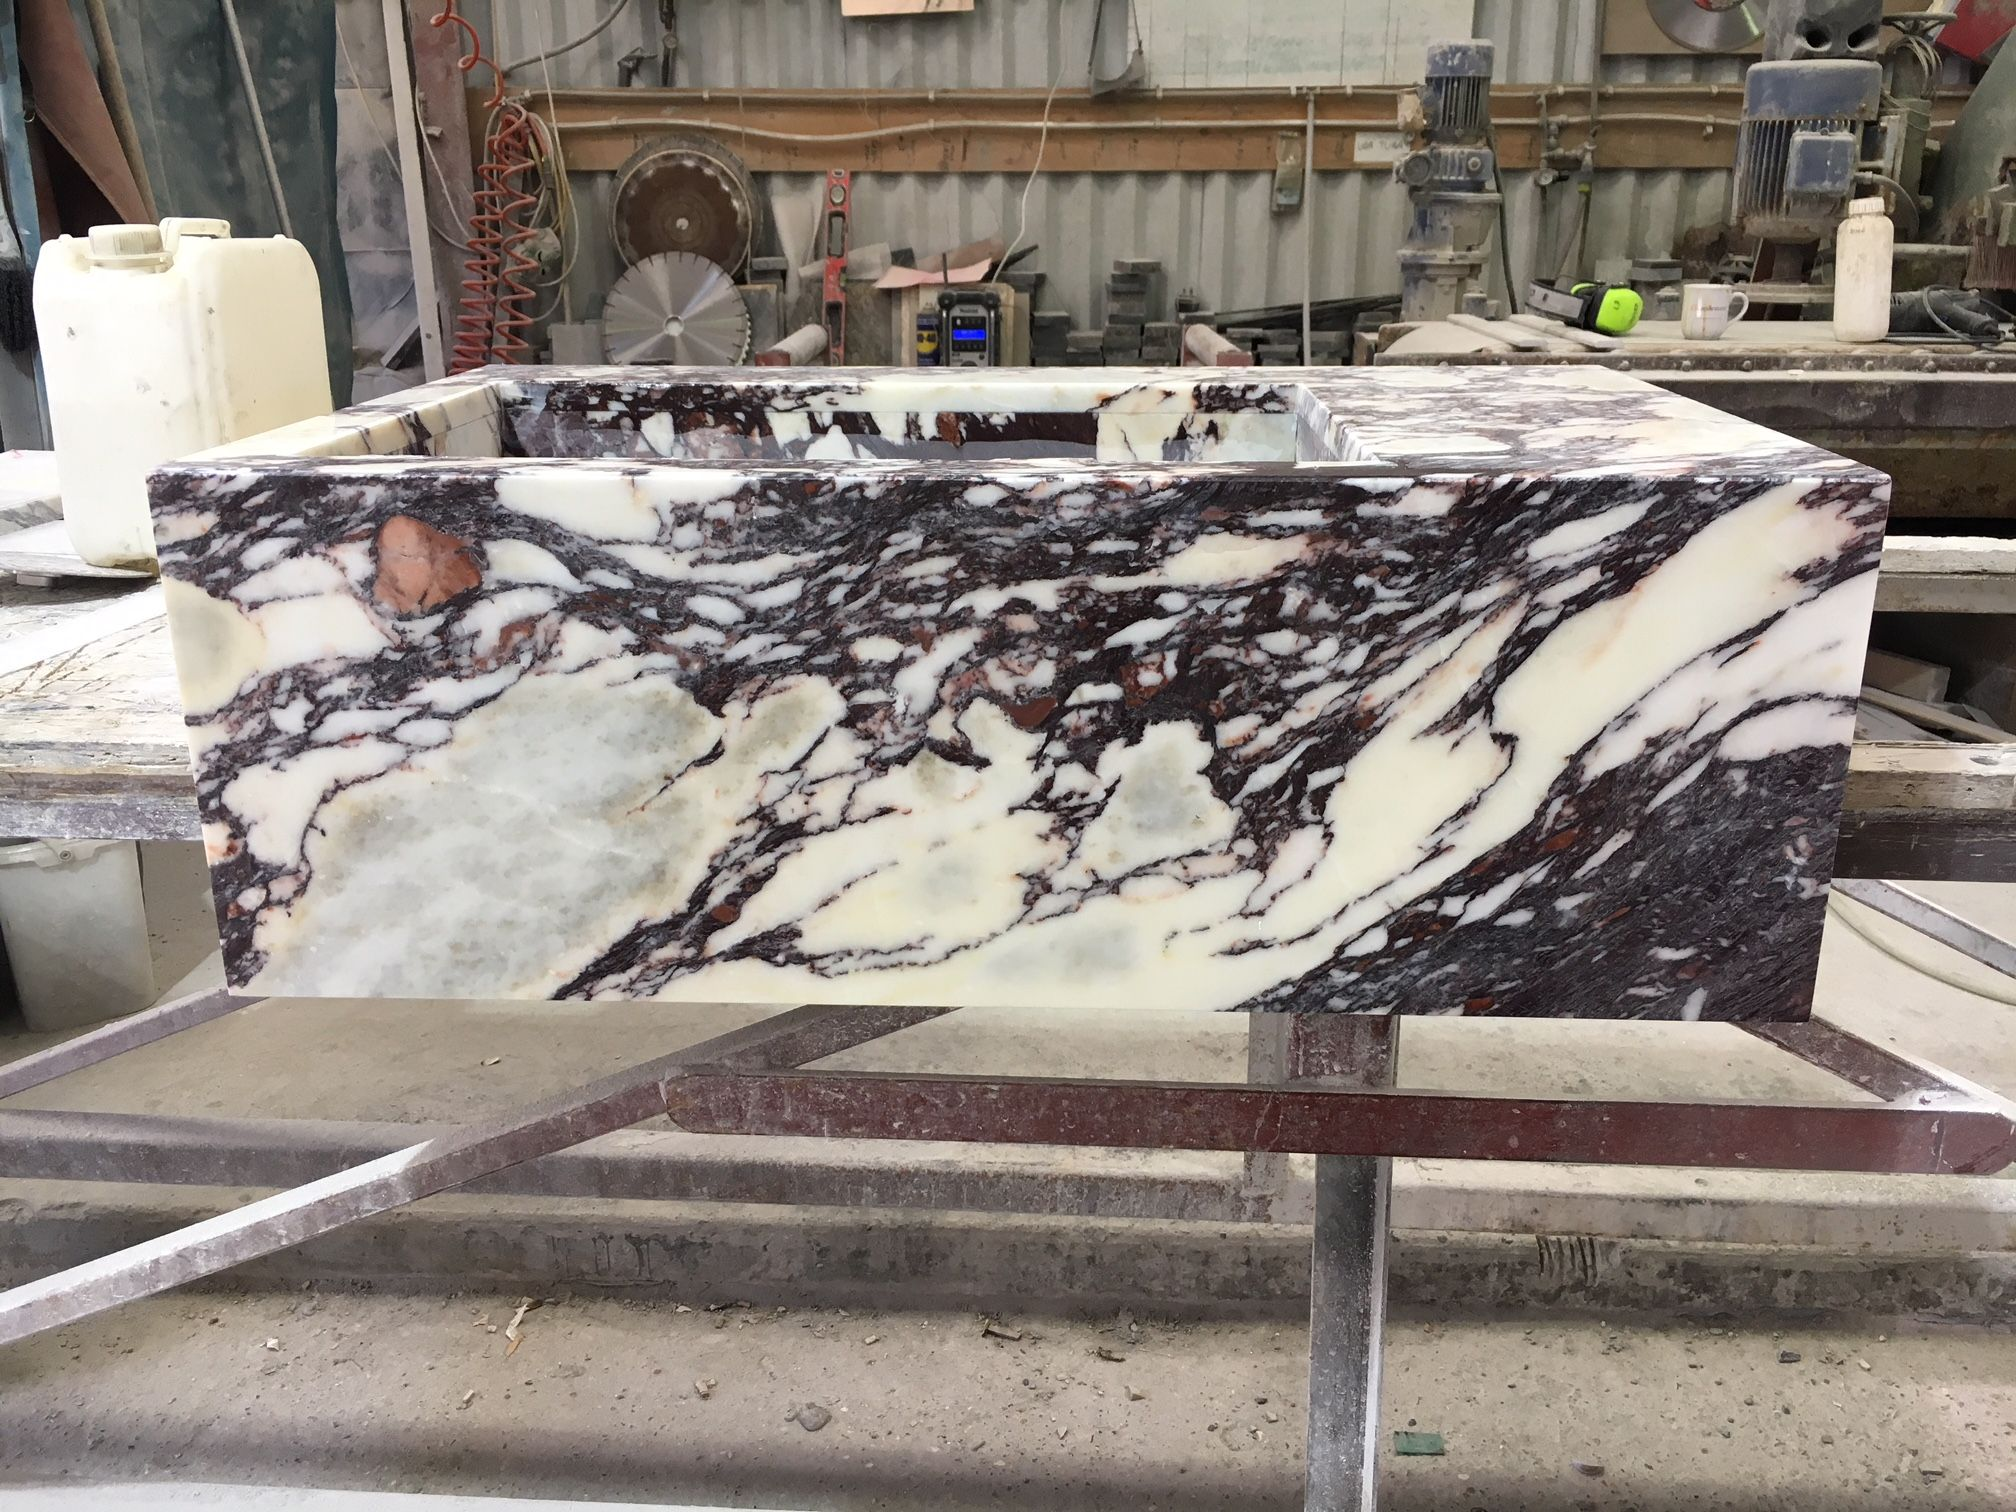 Making A Basin In Calacatta Viola Polished Marble Www Stoneofdestinydesign Co Uk At Stone Of Destiny Unit 1 Lines Fa Calacatta Bathroom Renovation Stone